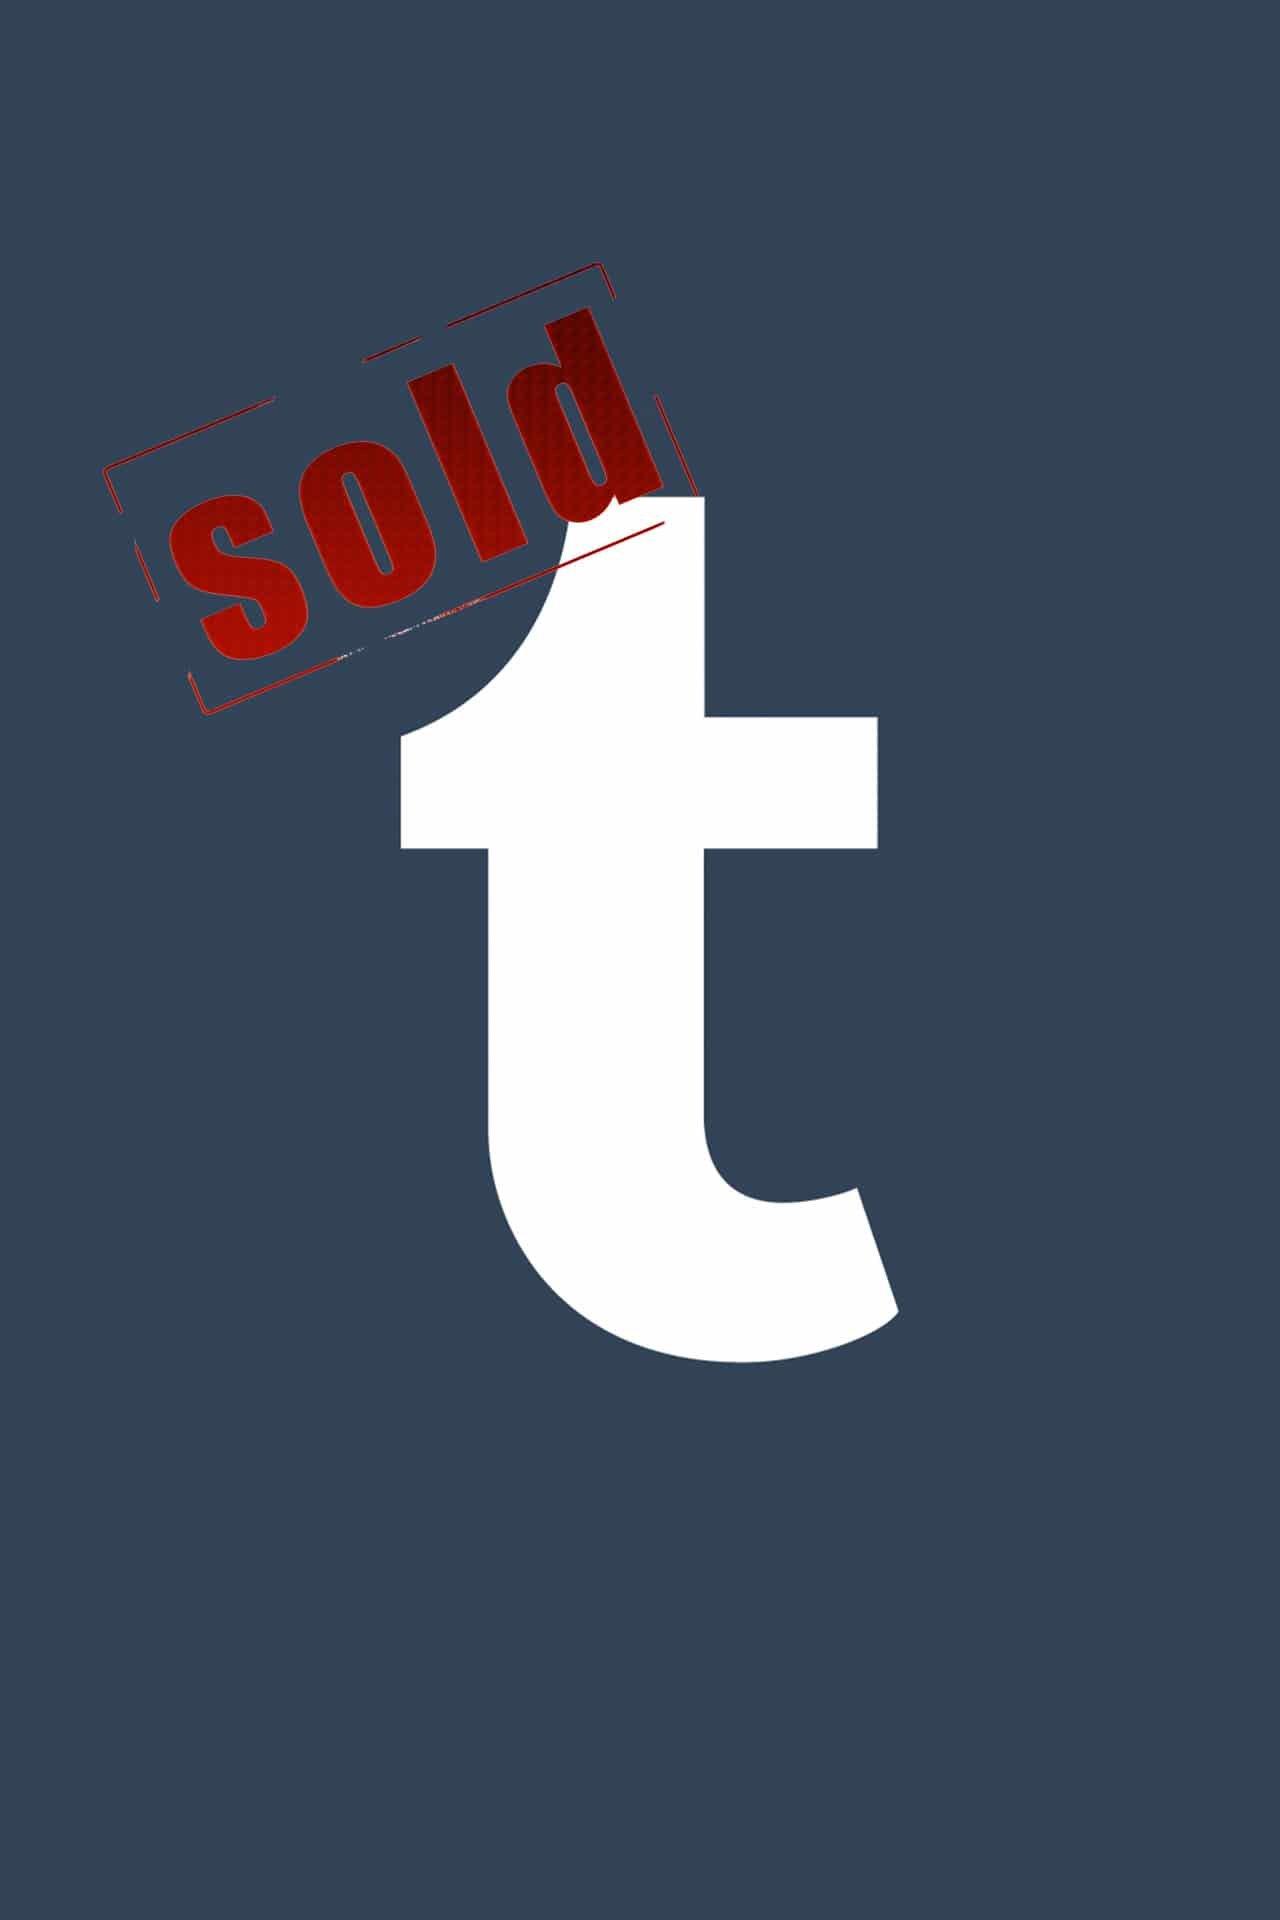 tumbler venduto ad automattic